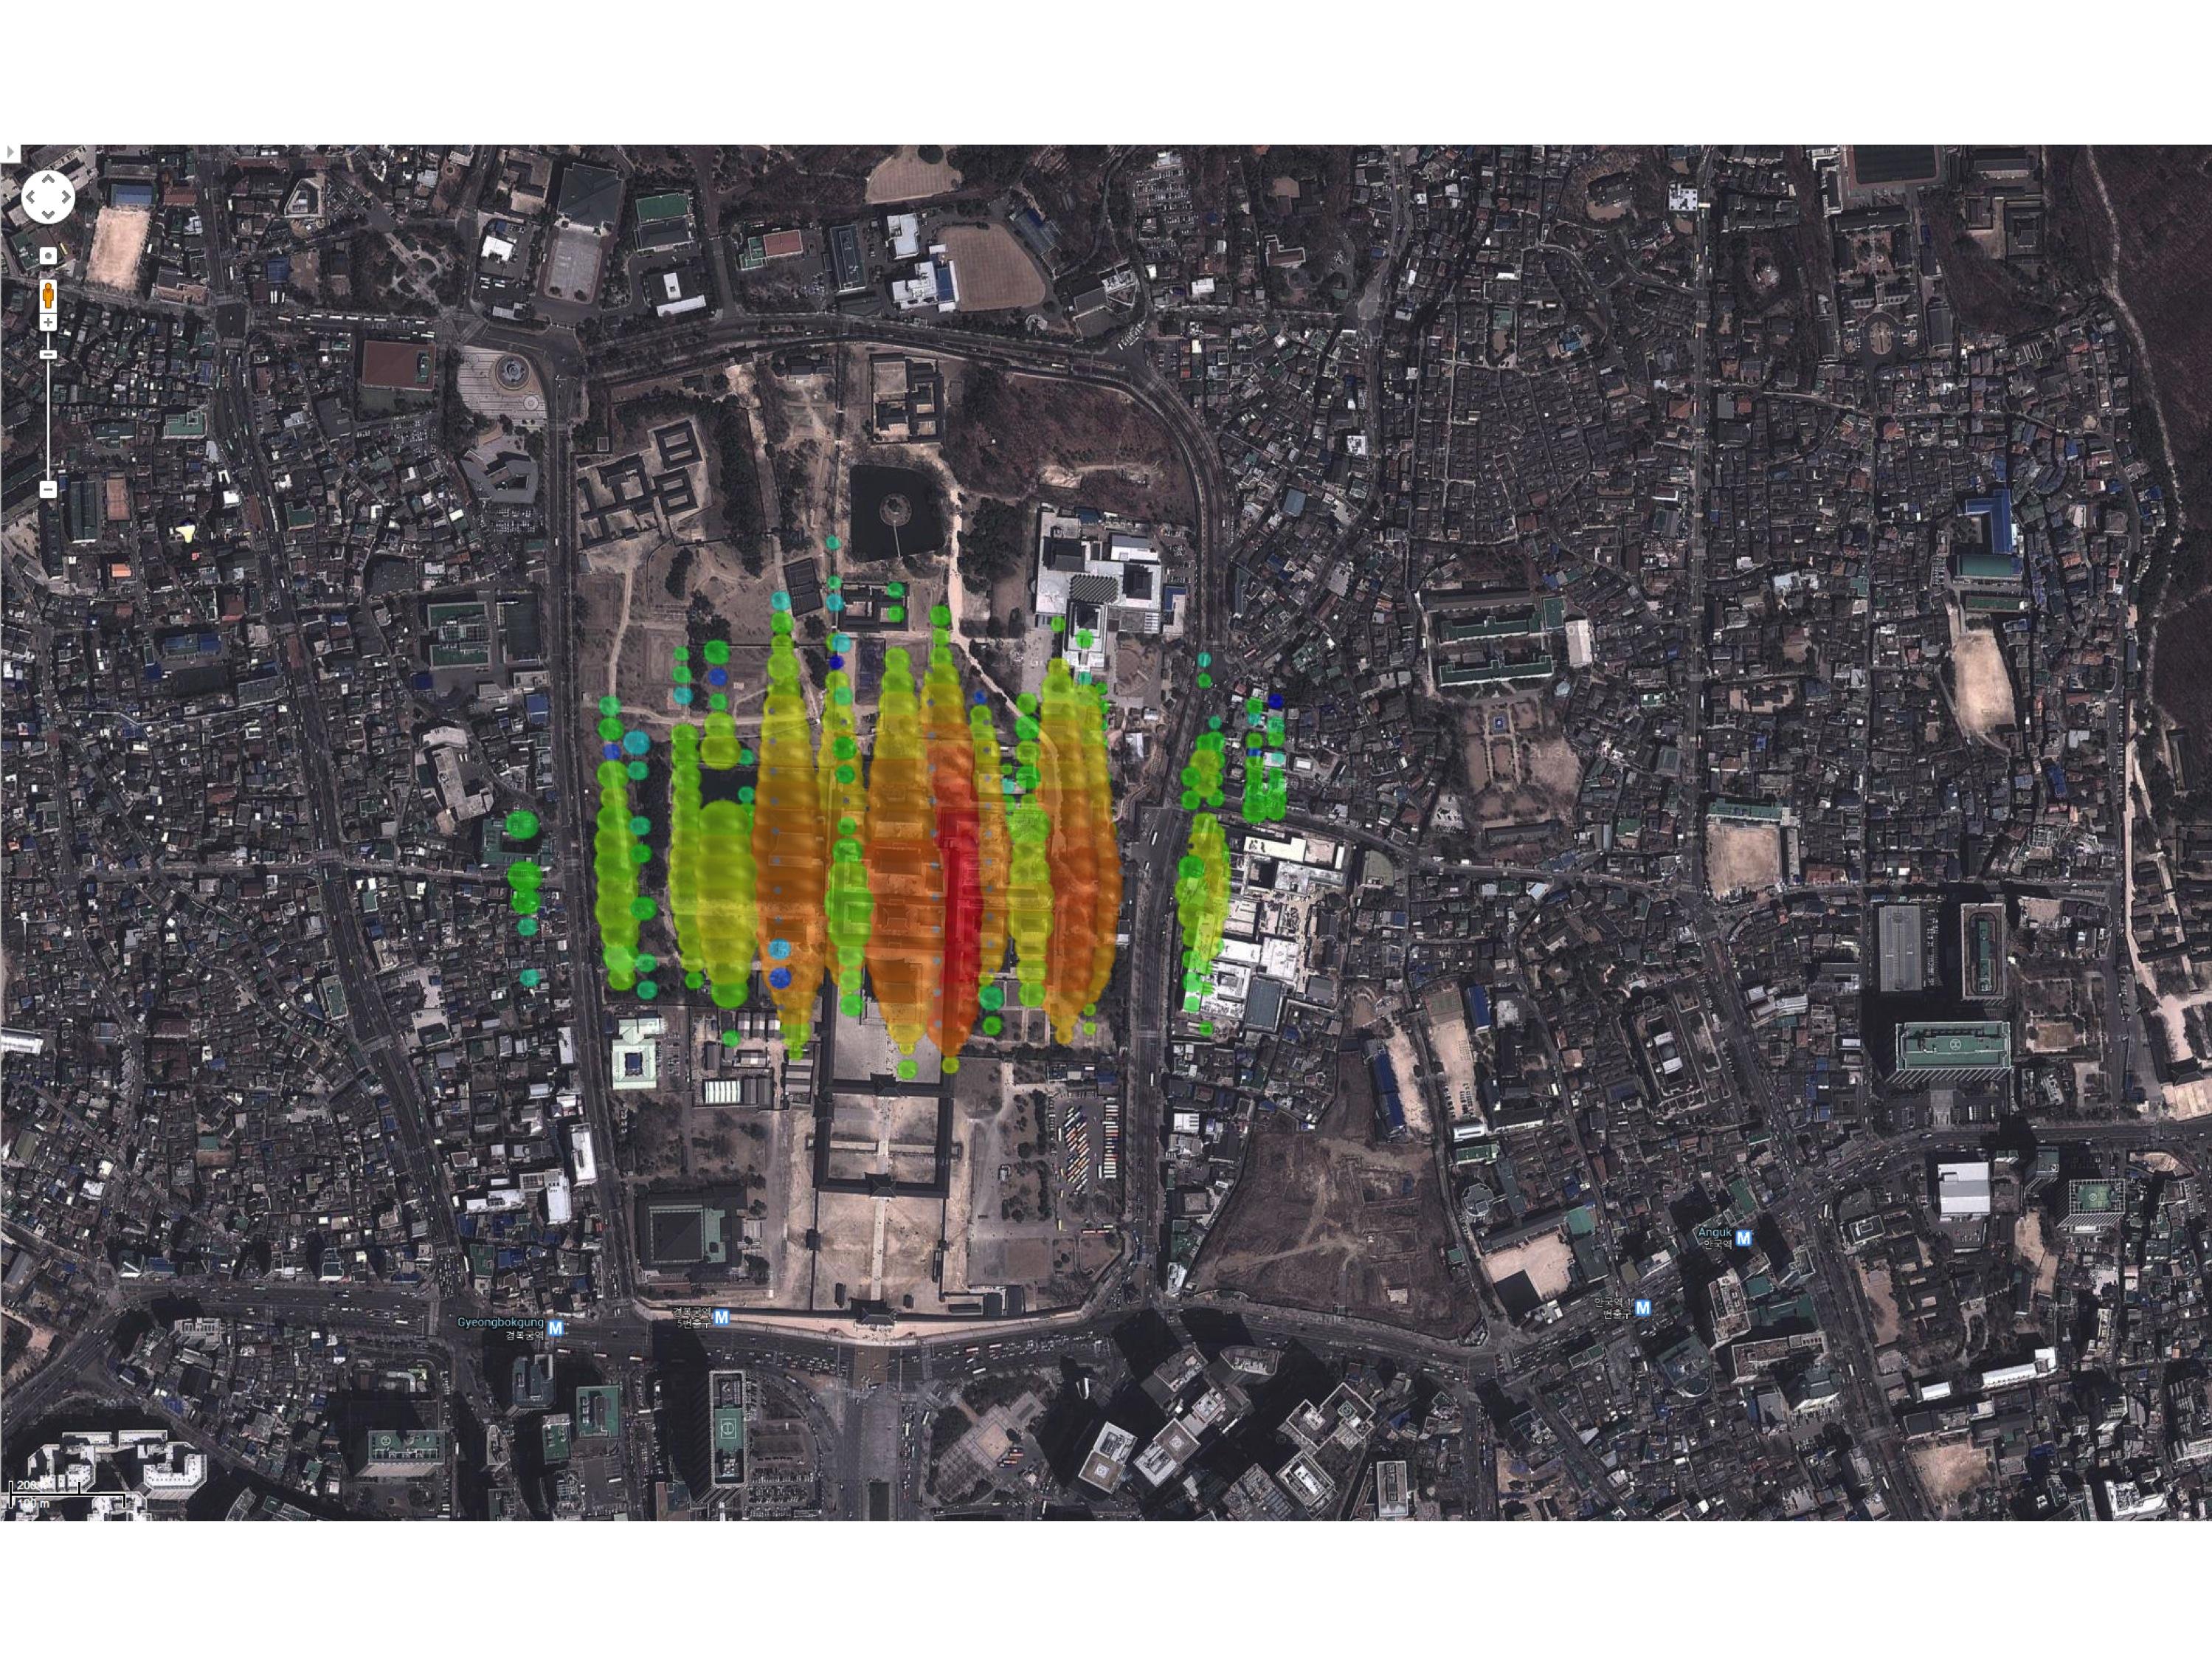 A high-energy neutrino over Seoul, Korea